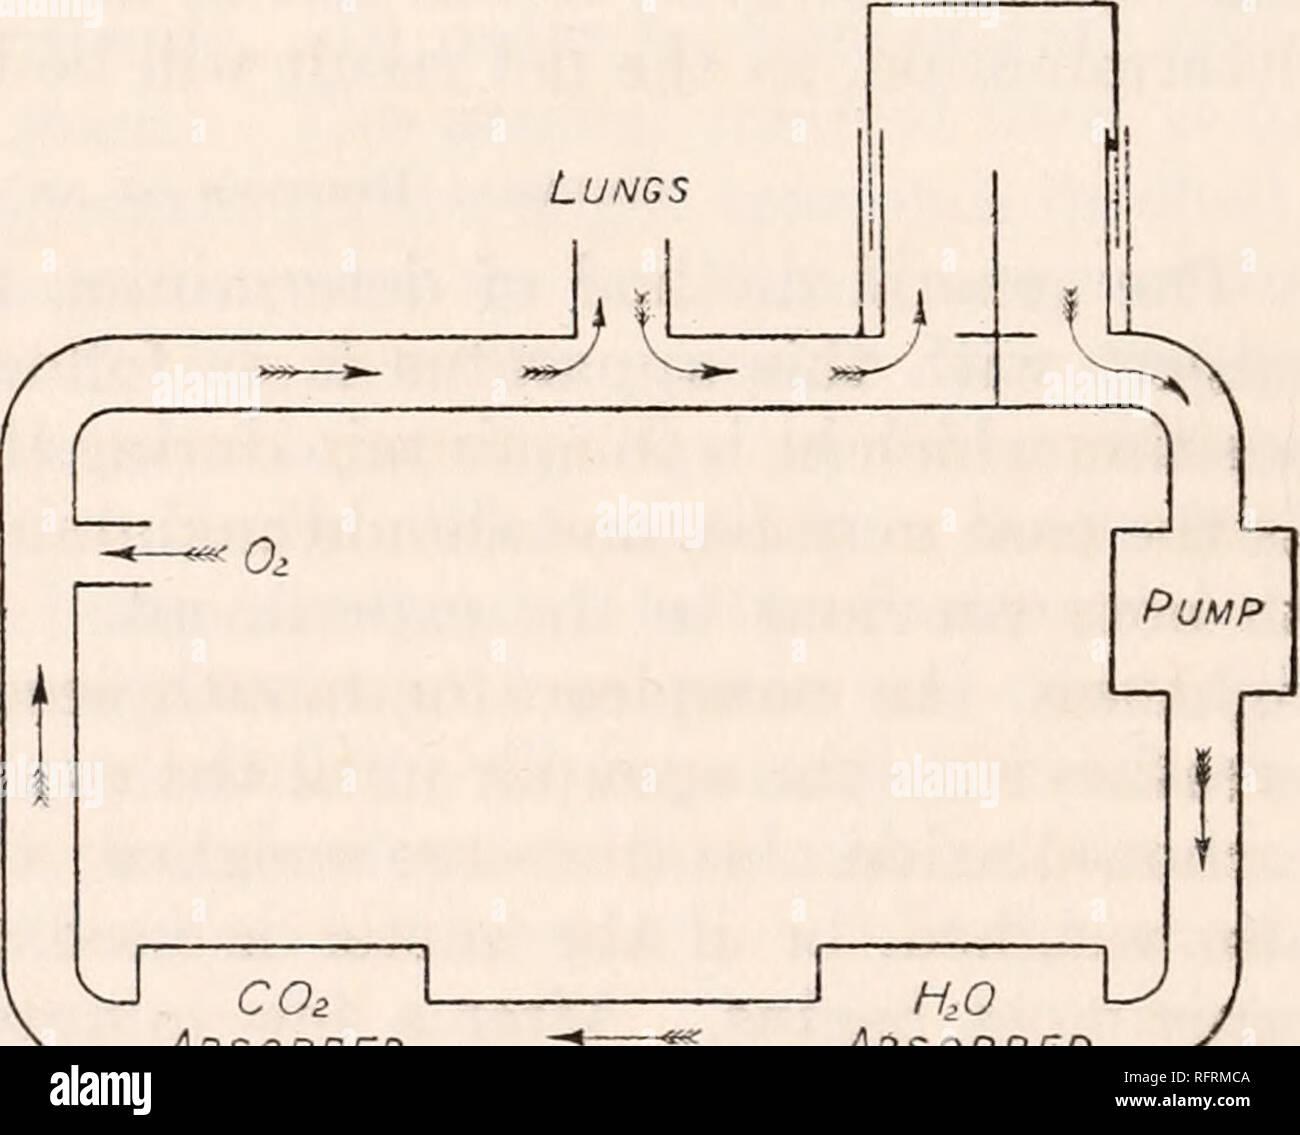 Carbon Dioxide Cylinder Stock Photos & Carbon Dioxide Cylinder Stock